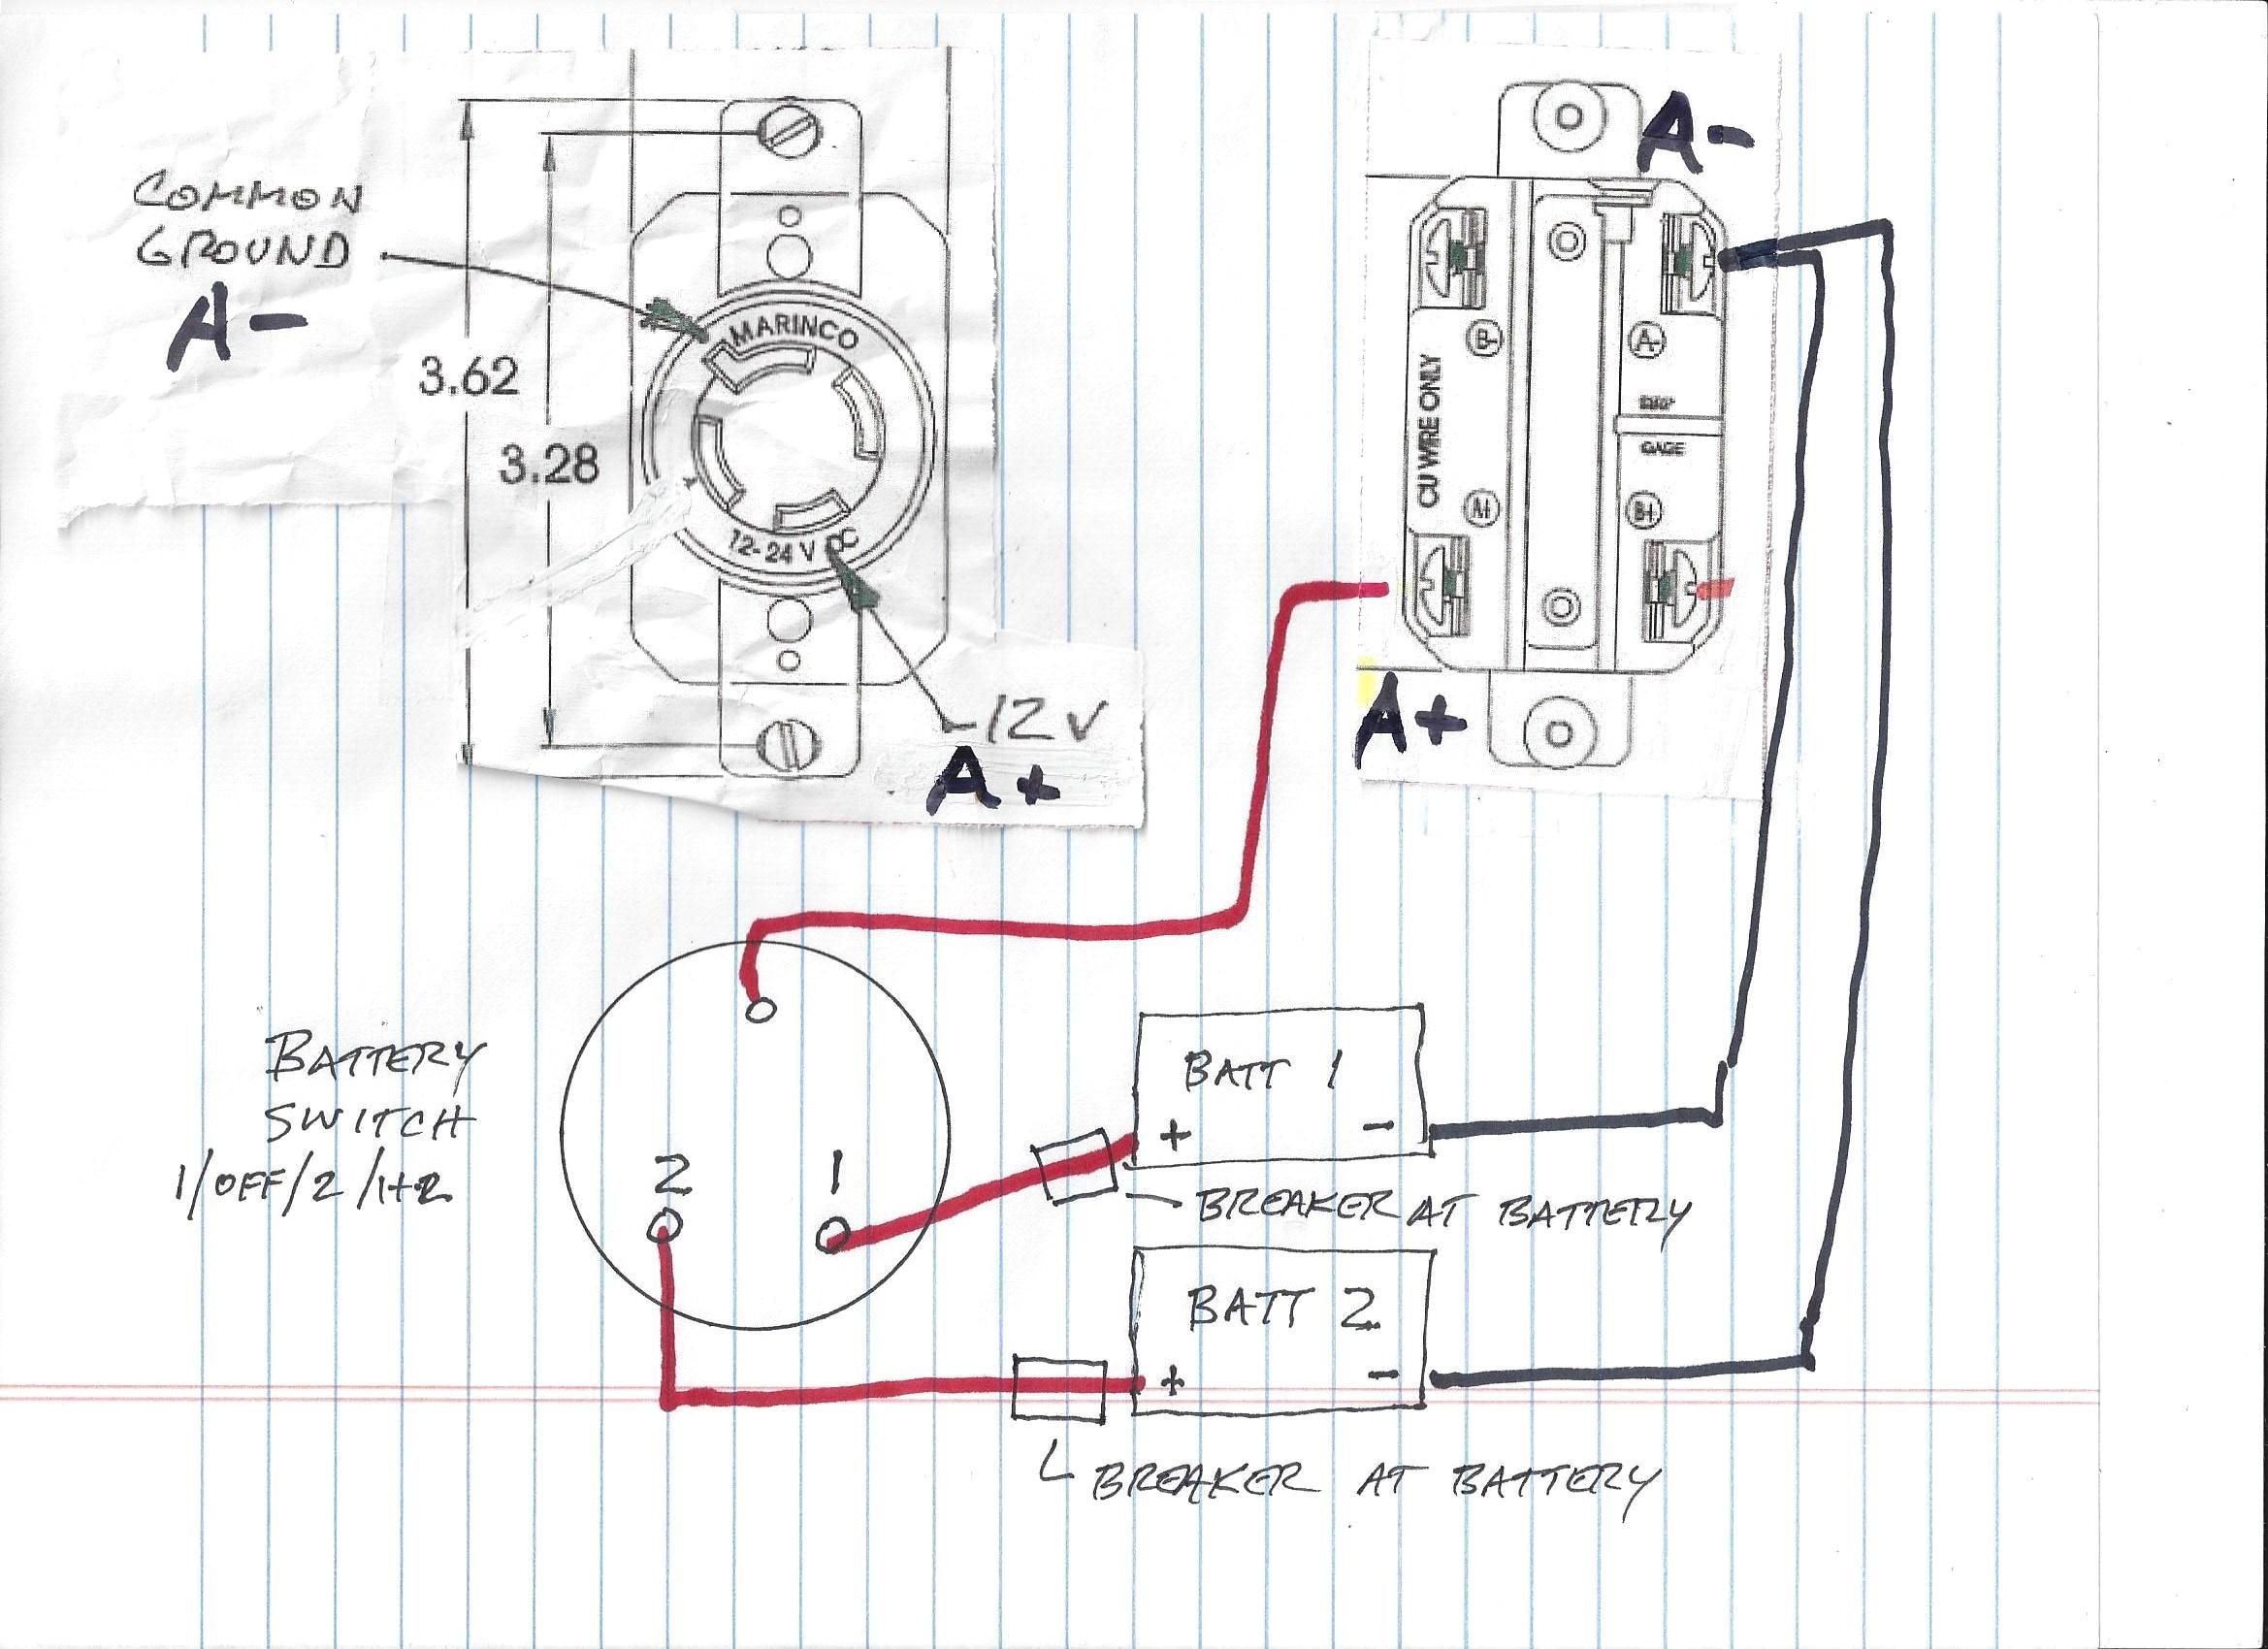 4 Wire Minn Kota Wiring Diagram | Wiring Diagram - Minn Kota Trolling Motor Plug And Receptacle Wiring Diagram